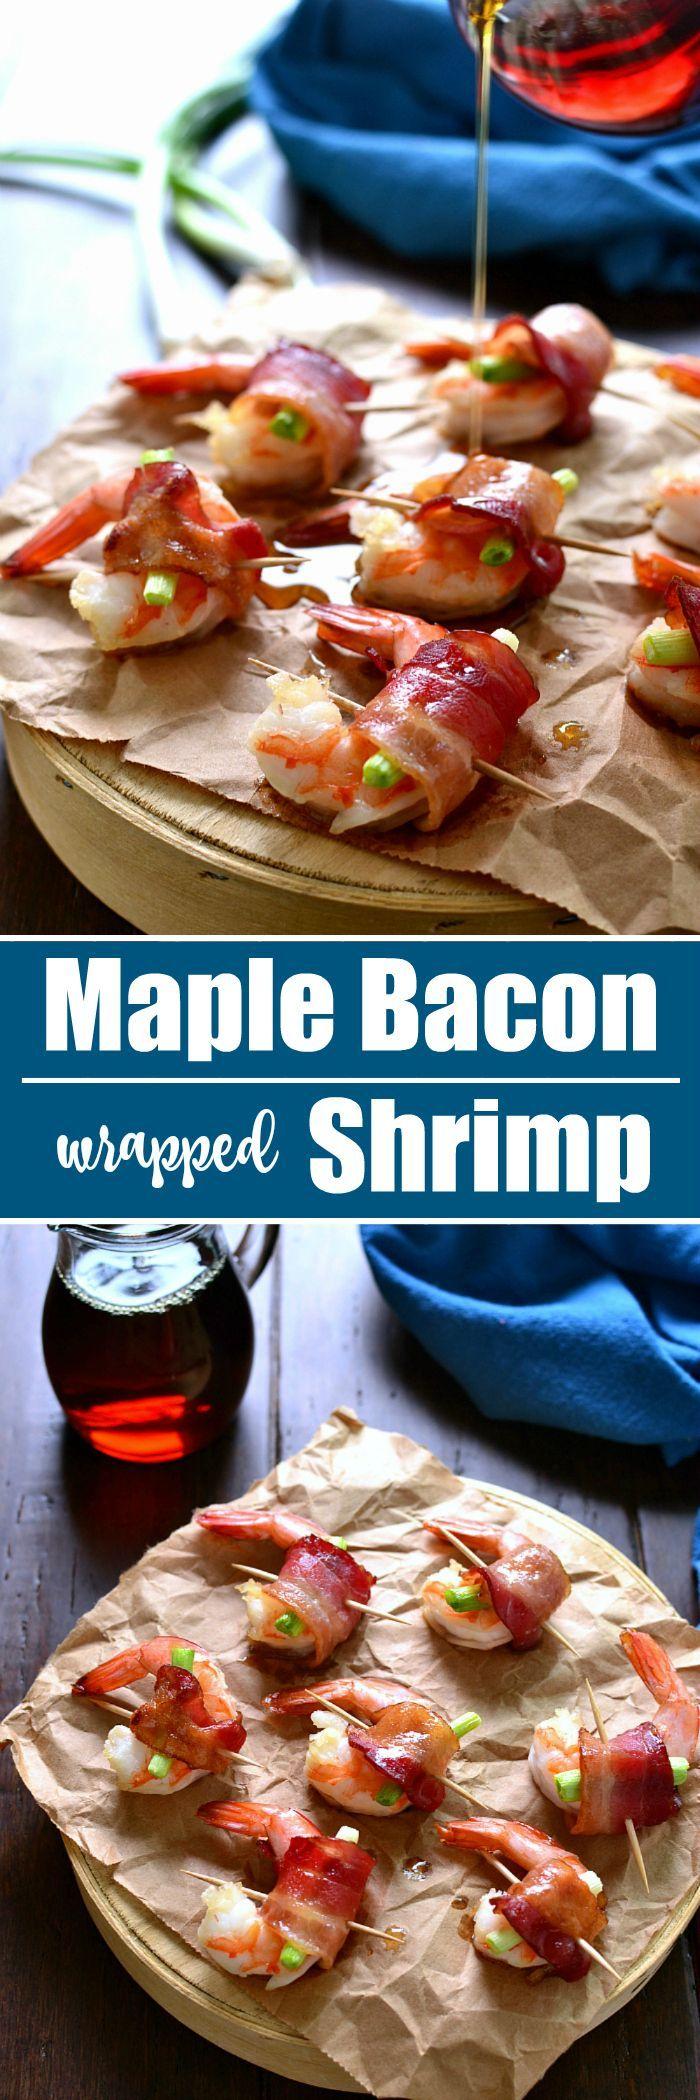 77 best Appetizers images on Pinterest   Savory snacks, Breakfast ...